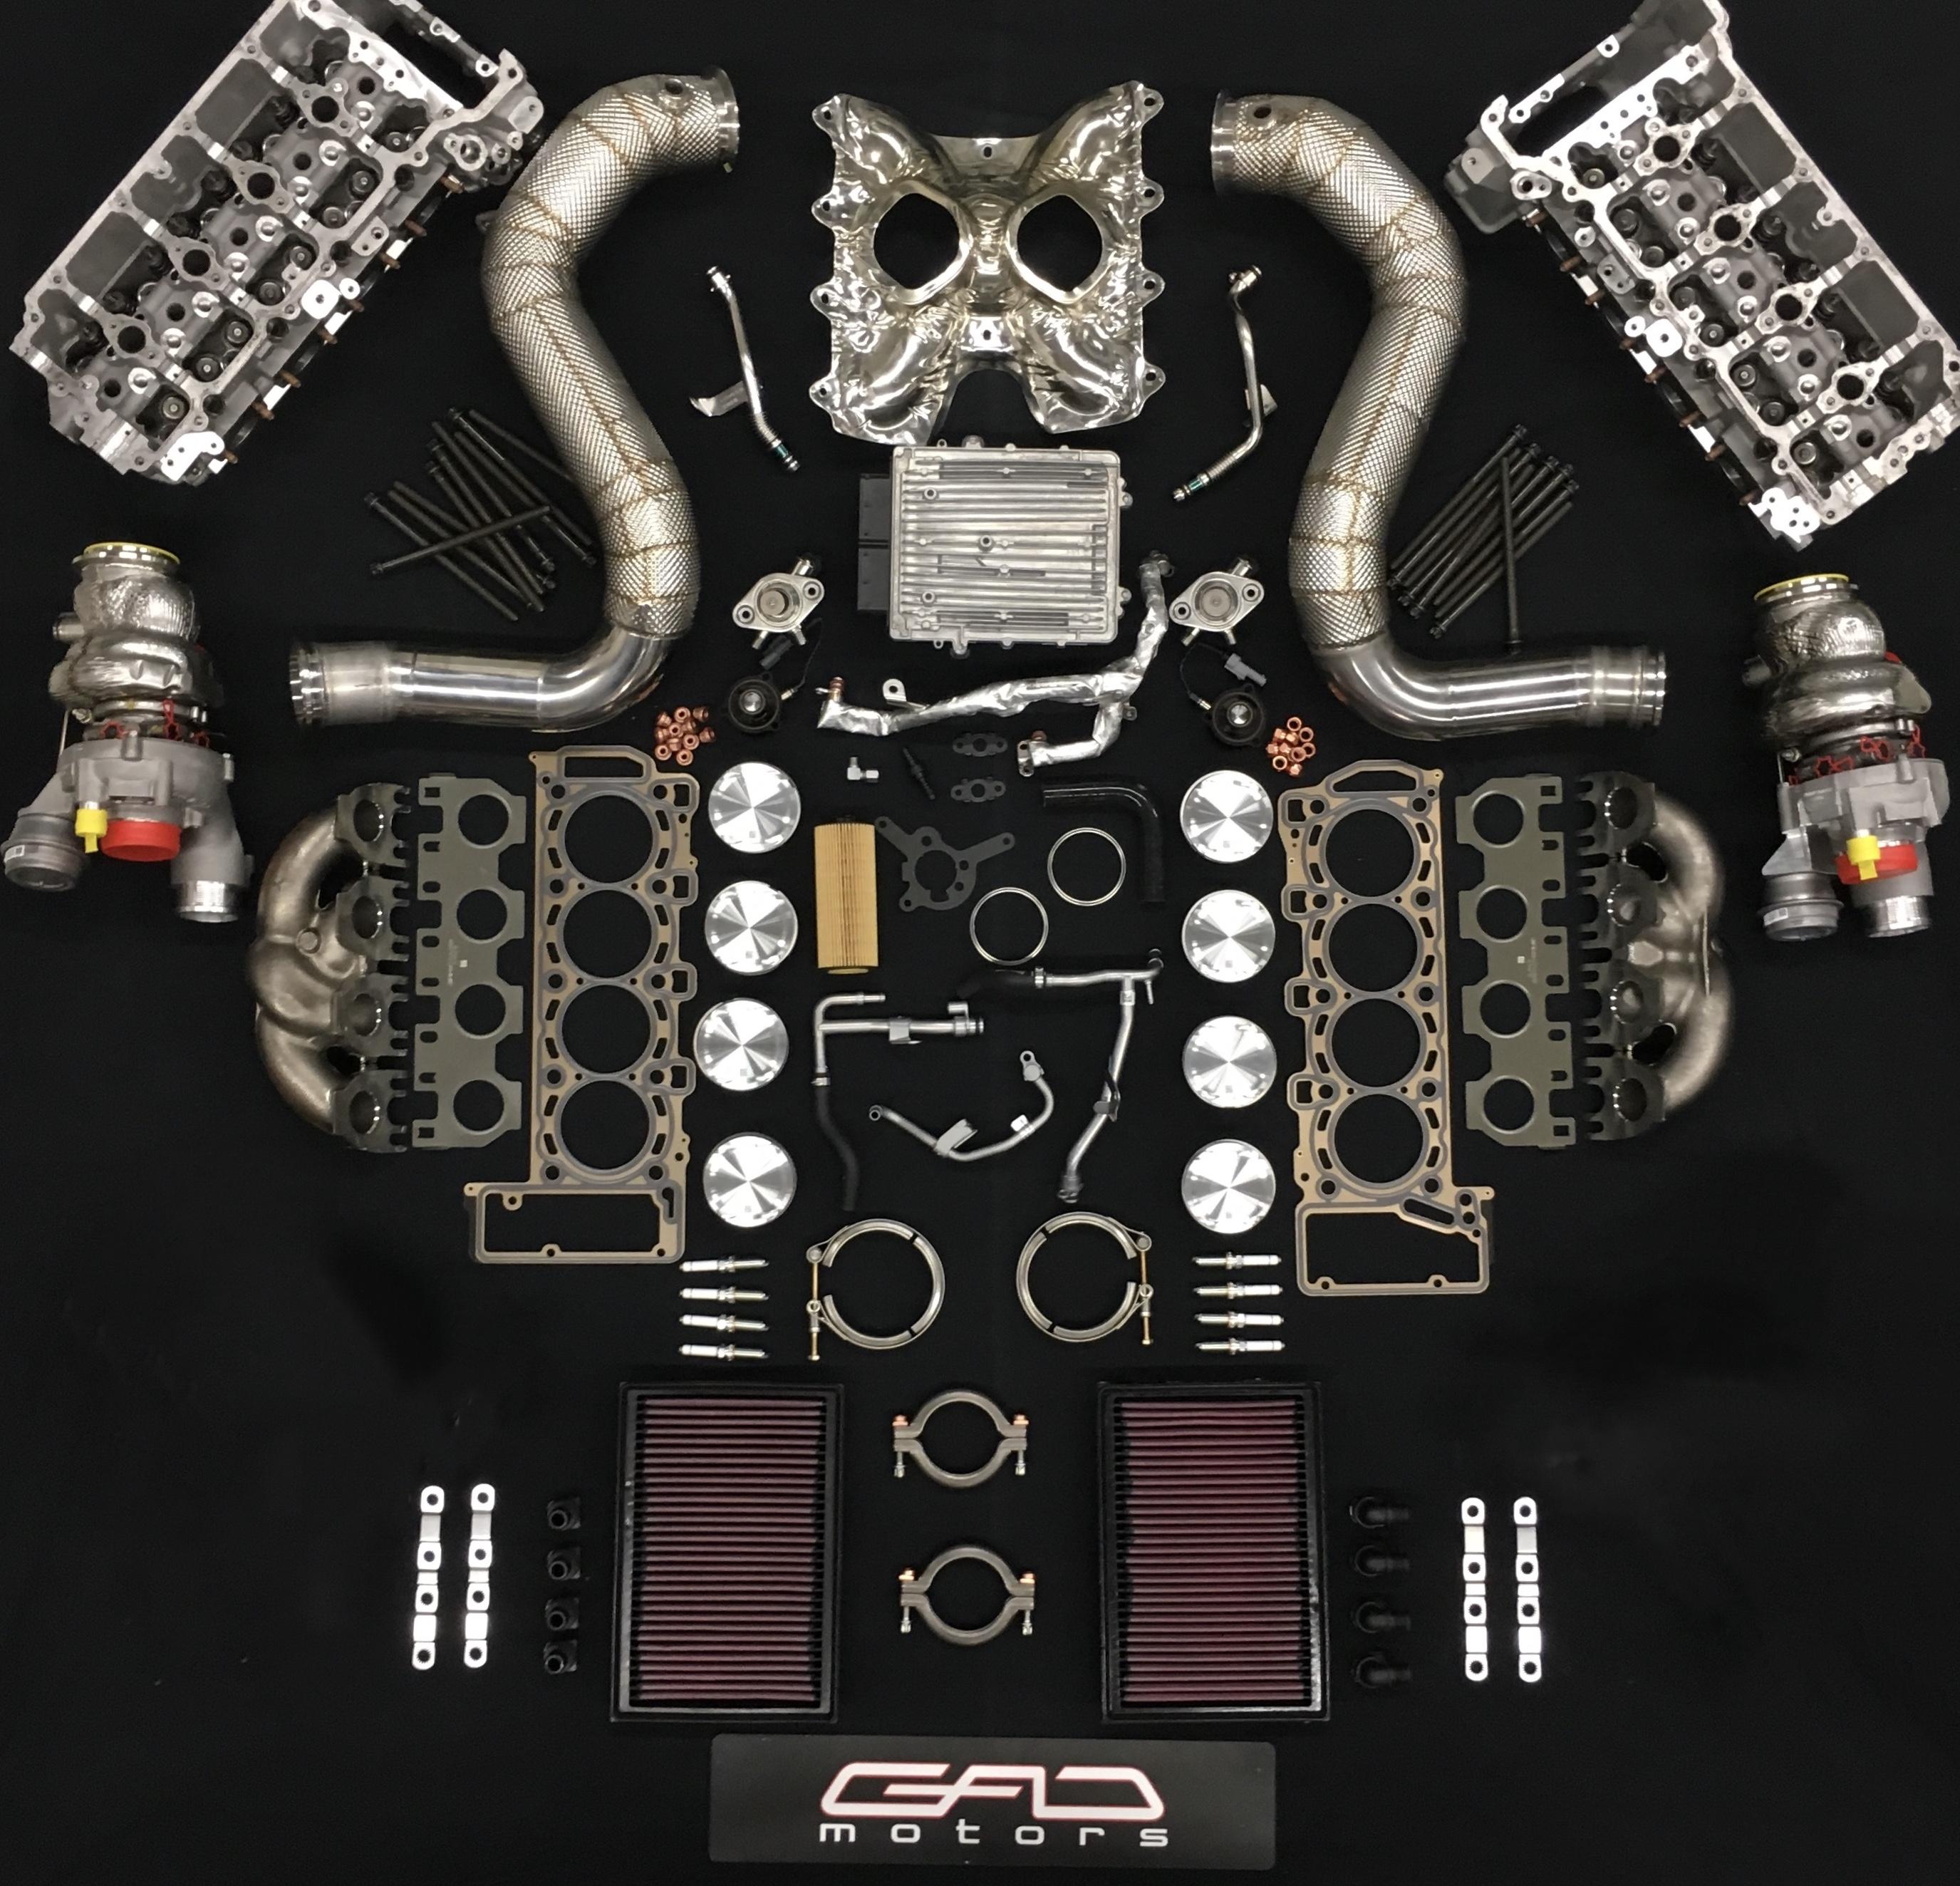 Stage 5 GAD-Motors